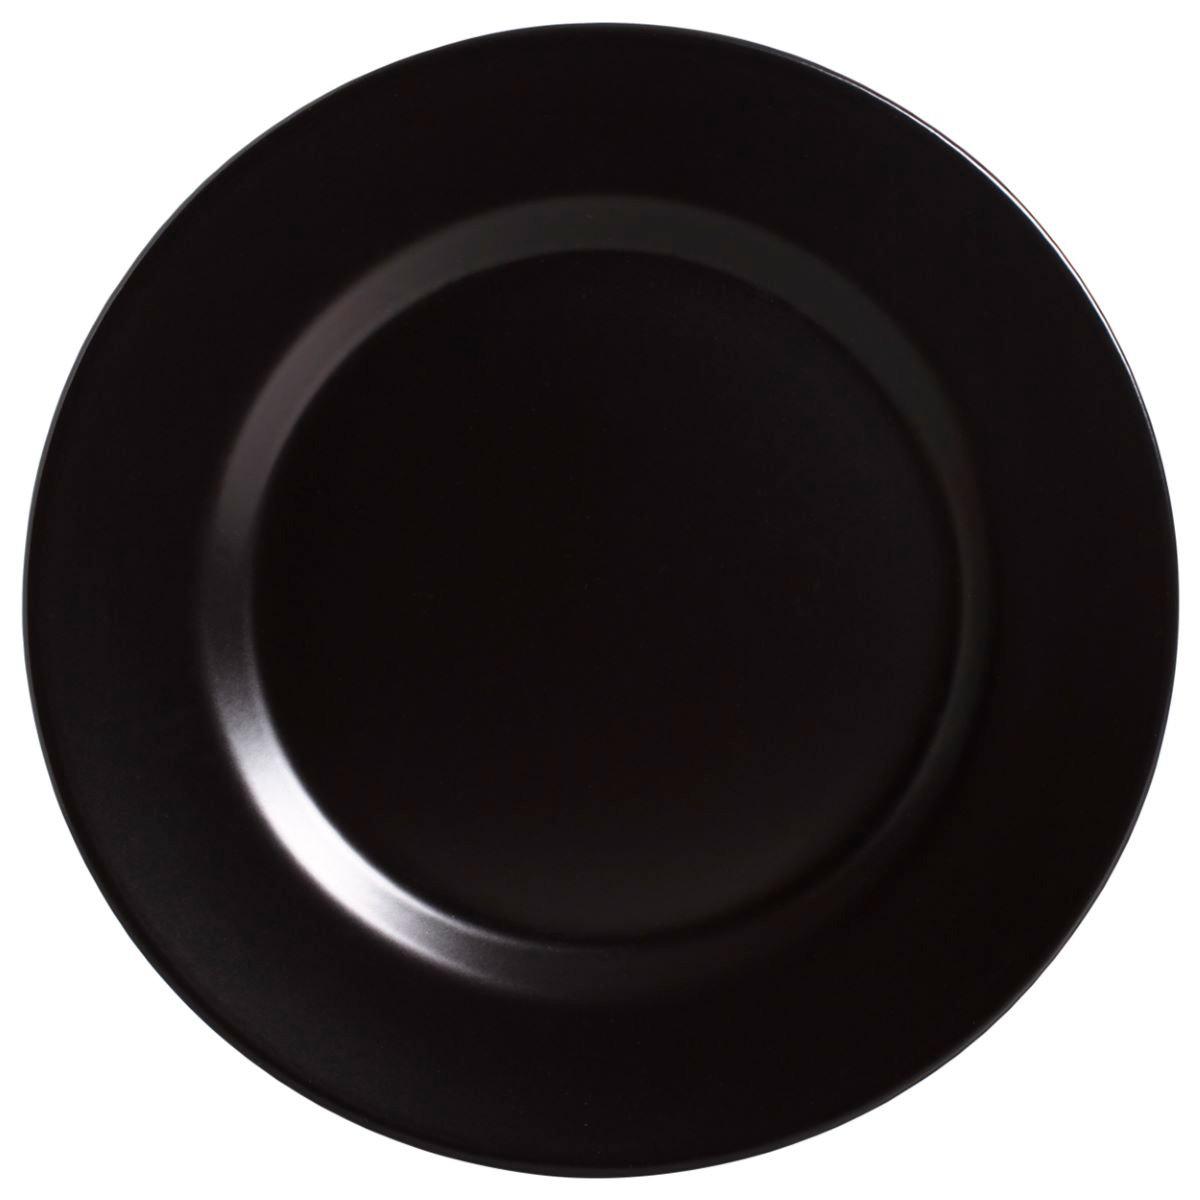 Prato Raso Preto Acetinado Cerâmica Alleanza - 6 Peças